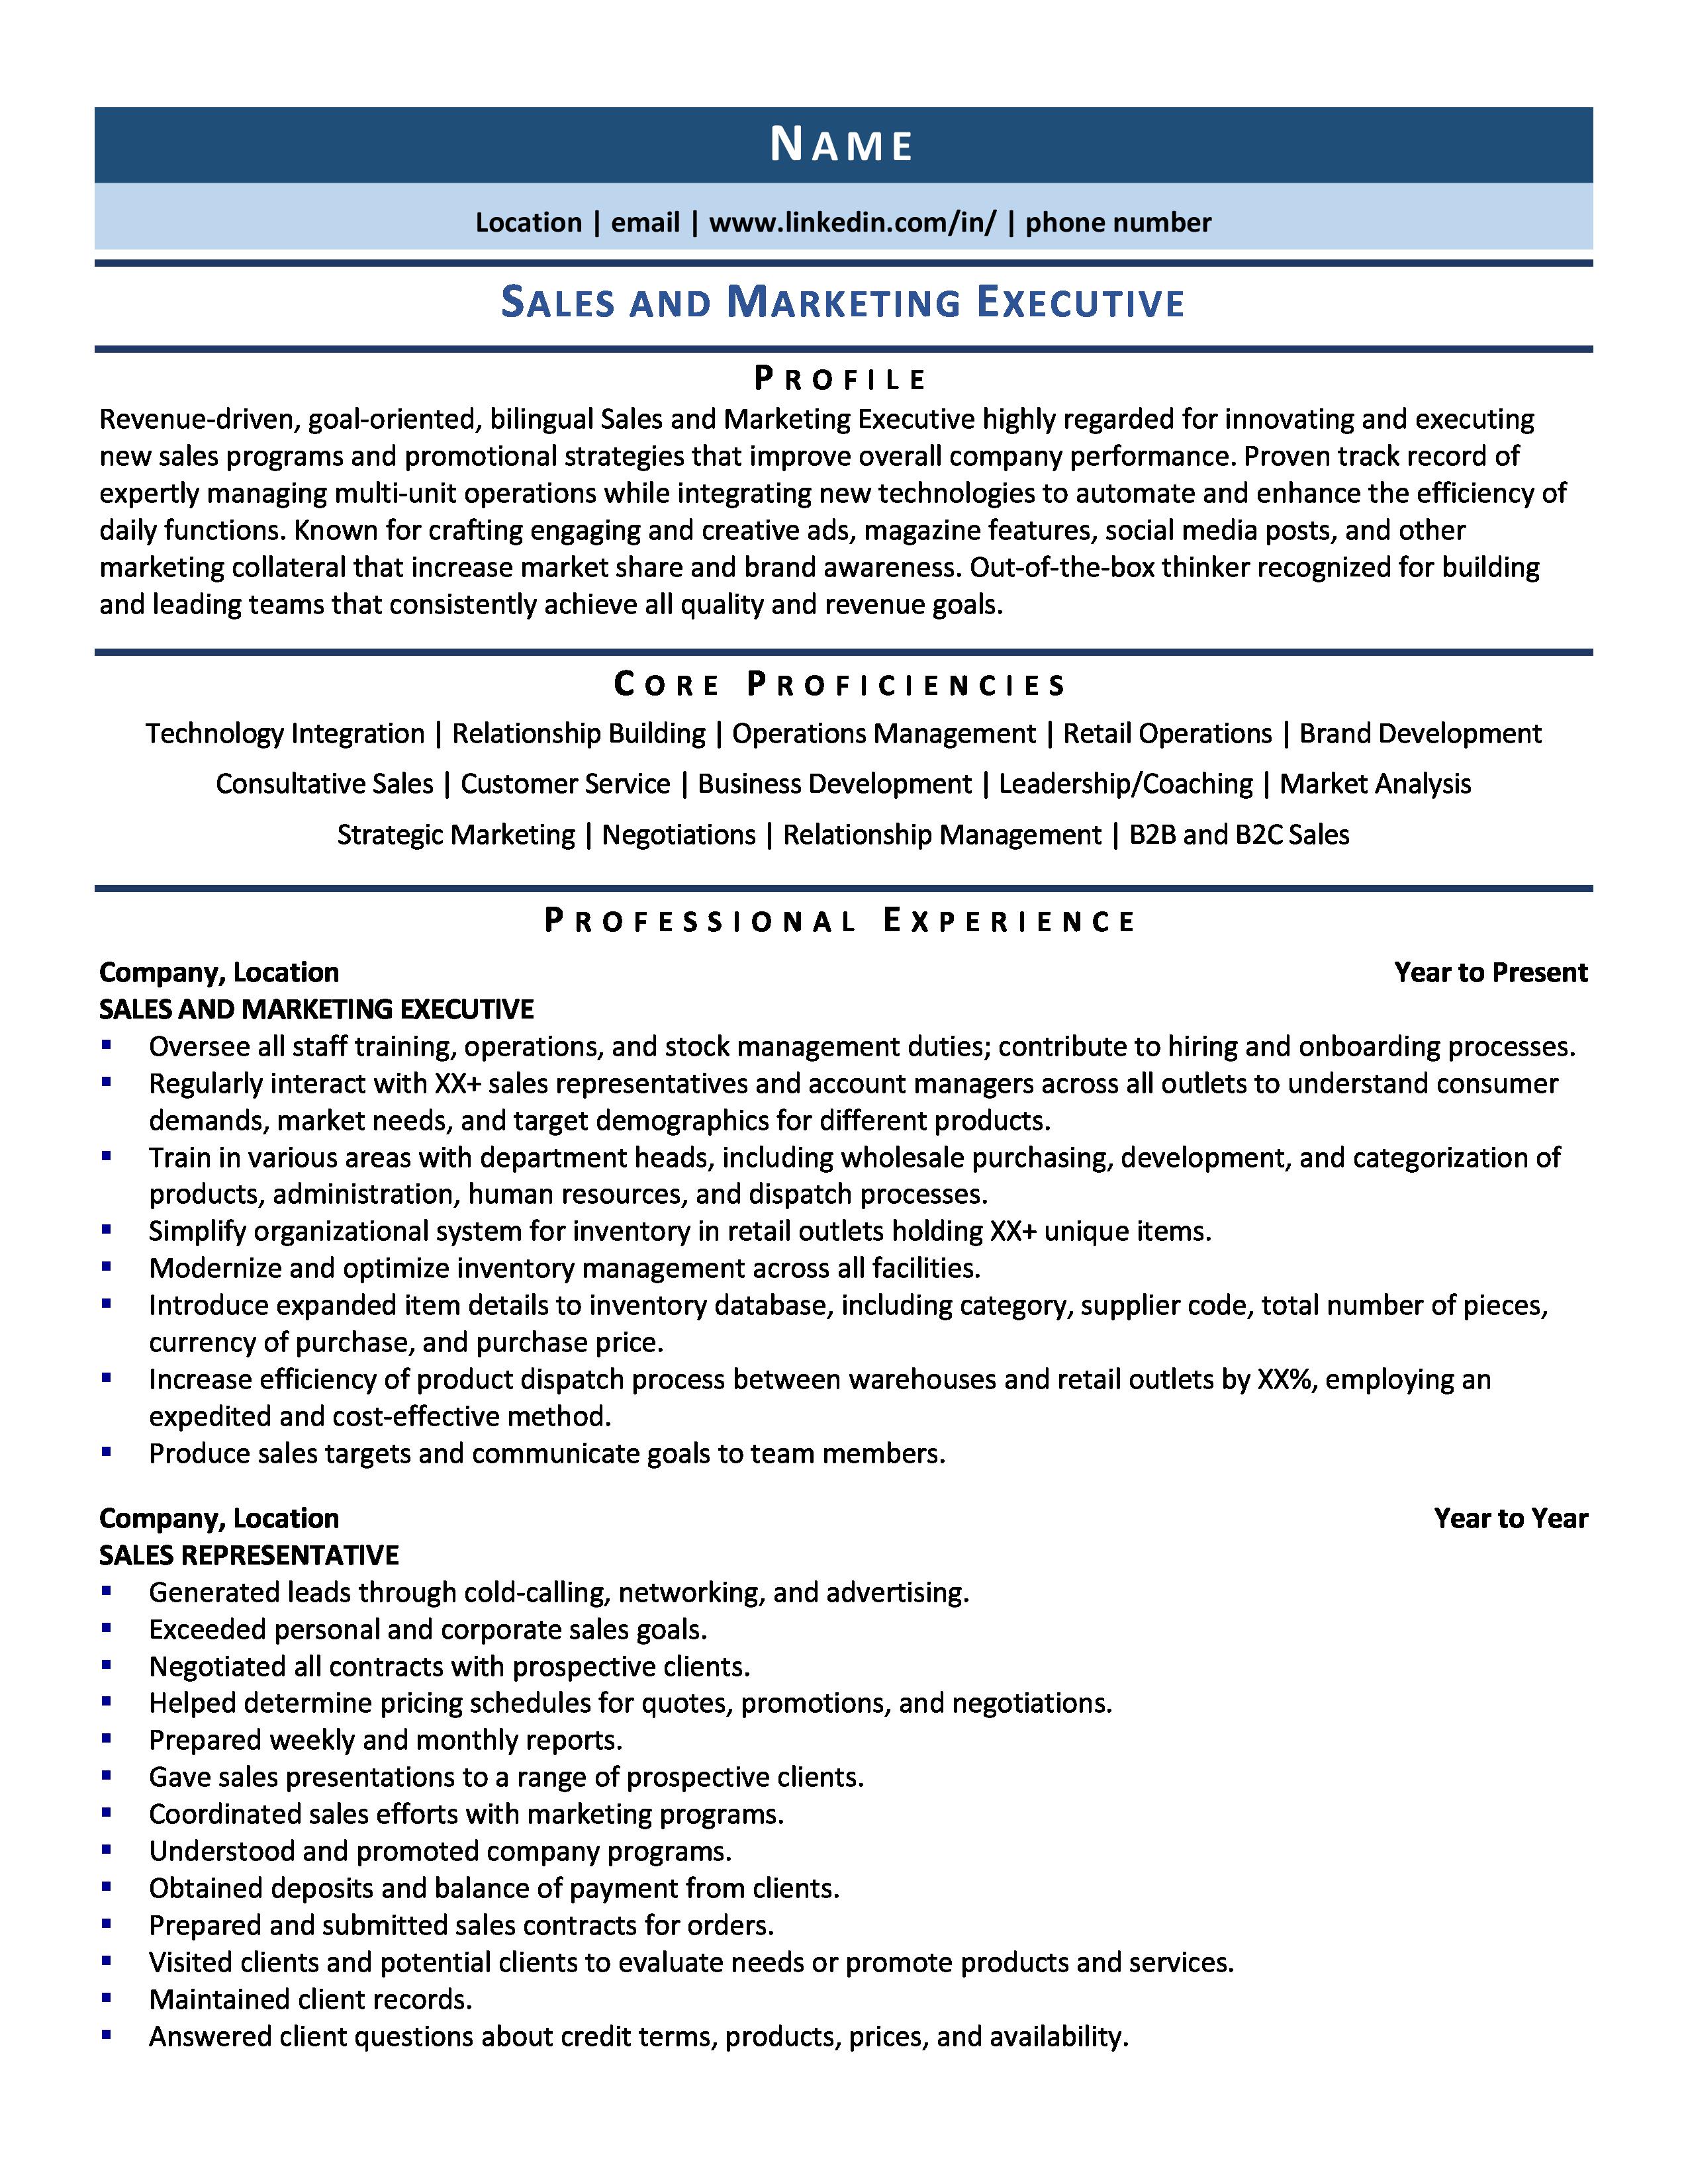 Salesresume Salesresumetemplate Salesresumeexample Professionalresume Salescv Resumeminimalist In 2021 Executive Resume Sales And Marketing Sales Resume Examples